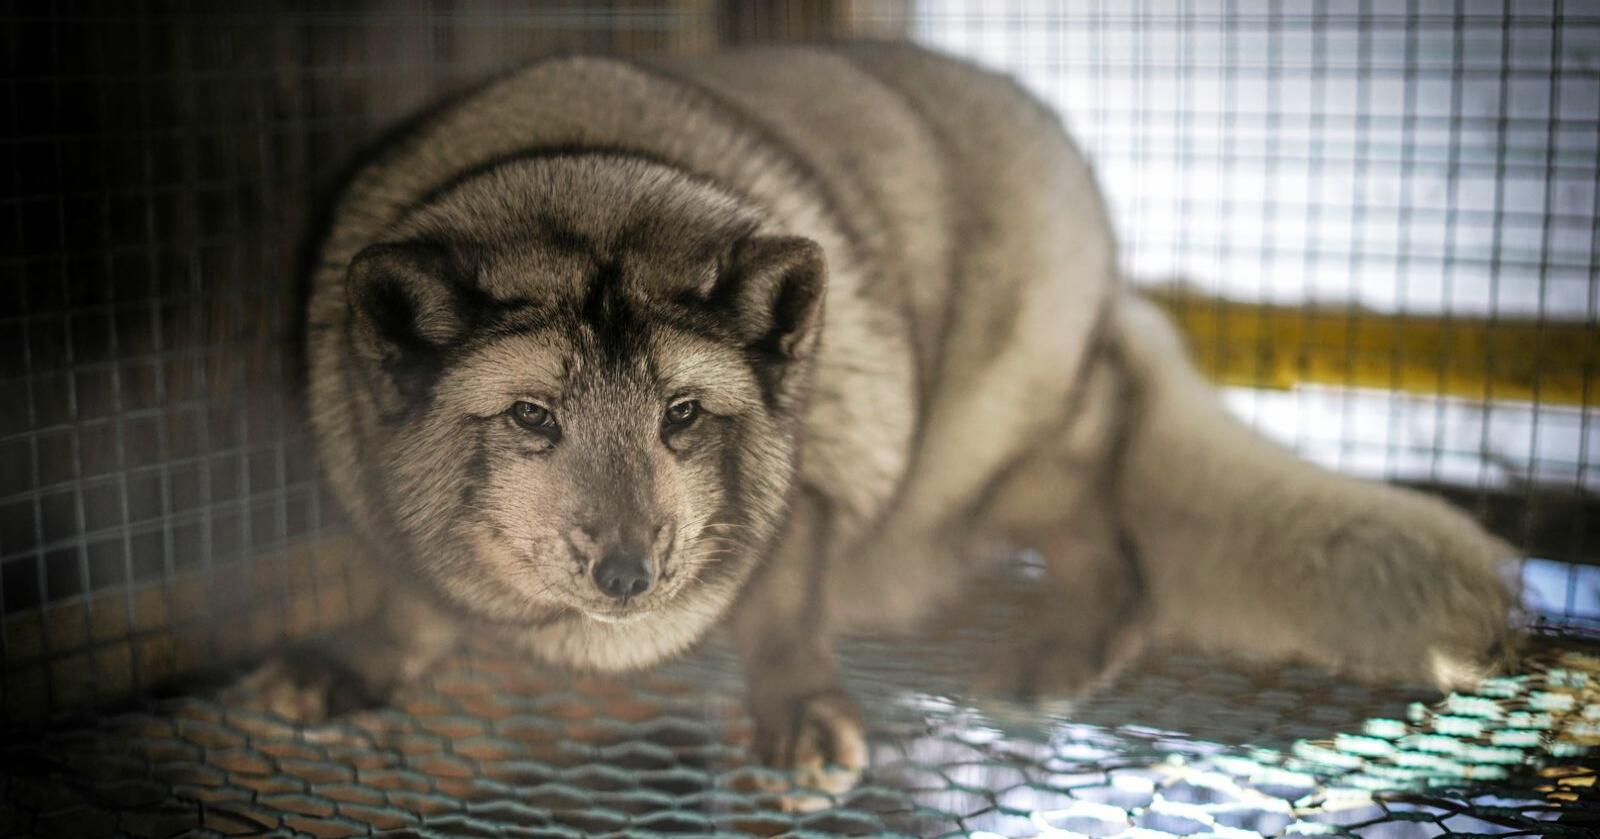 Norge har jobbet på overtid og halt ut pelsdyrenes lidelser altfor lenge, skriver Jenny Rolness i Dyrenes Rett. Foto: Benjamin Hernes Vogl